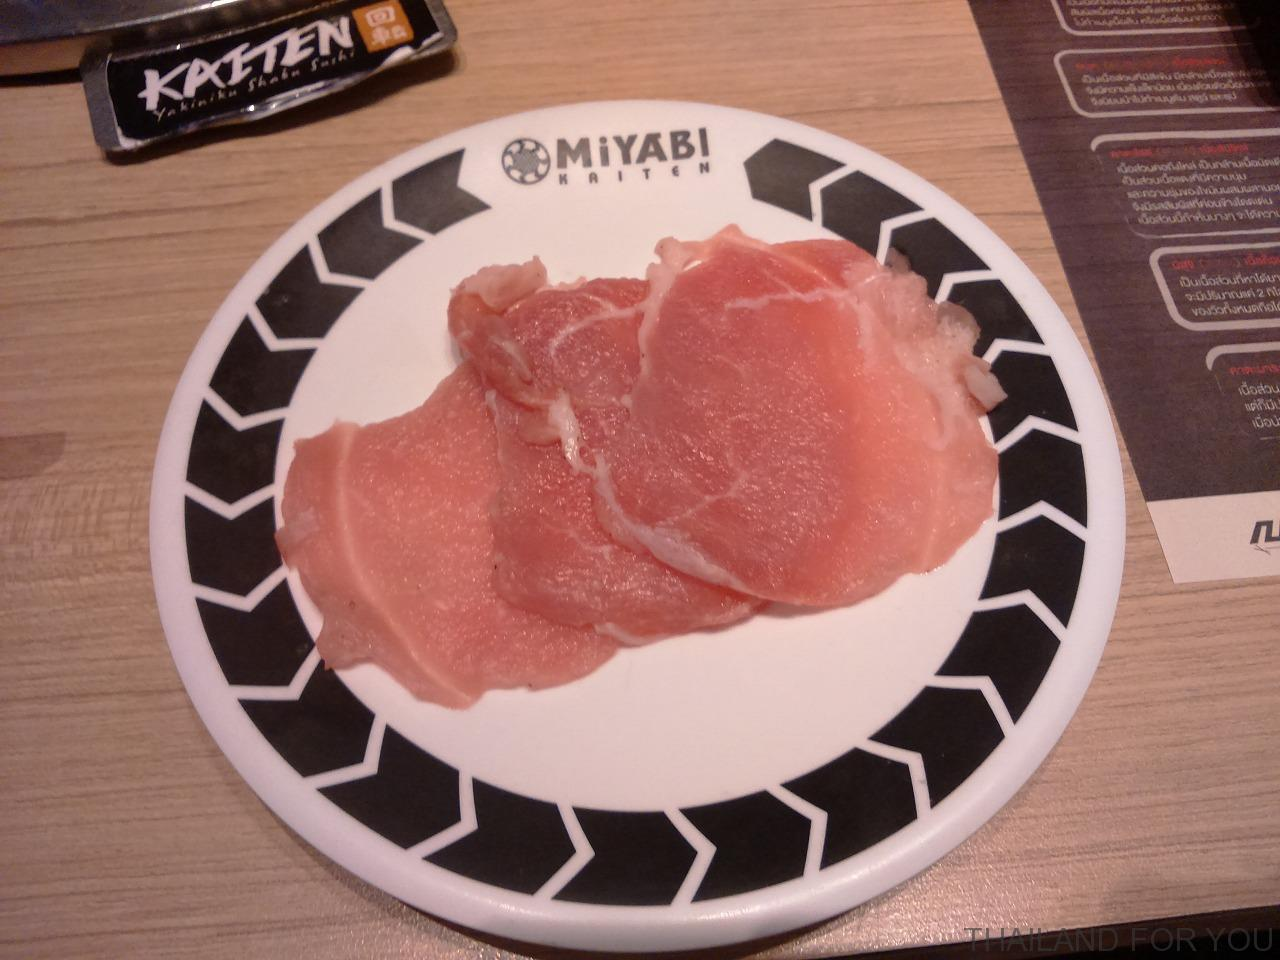 KAITEN(回転) タイ 焼き肉 しゃぶしゃぶ 写真